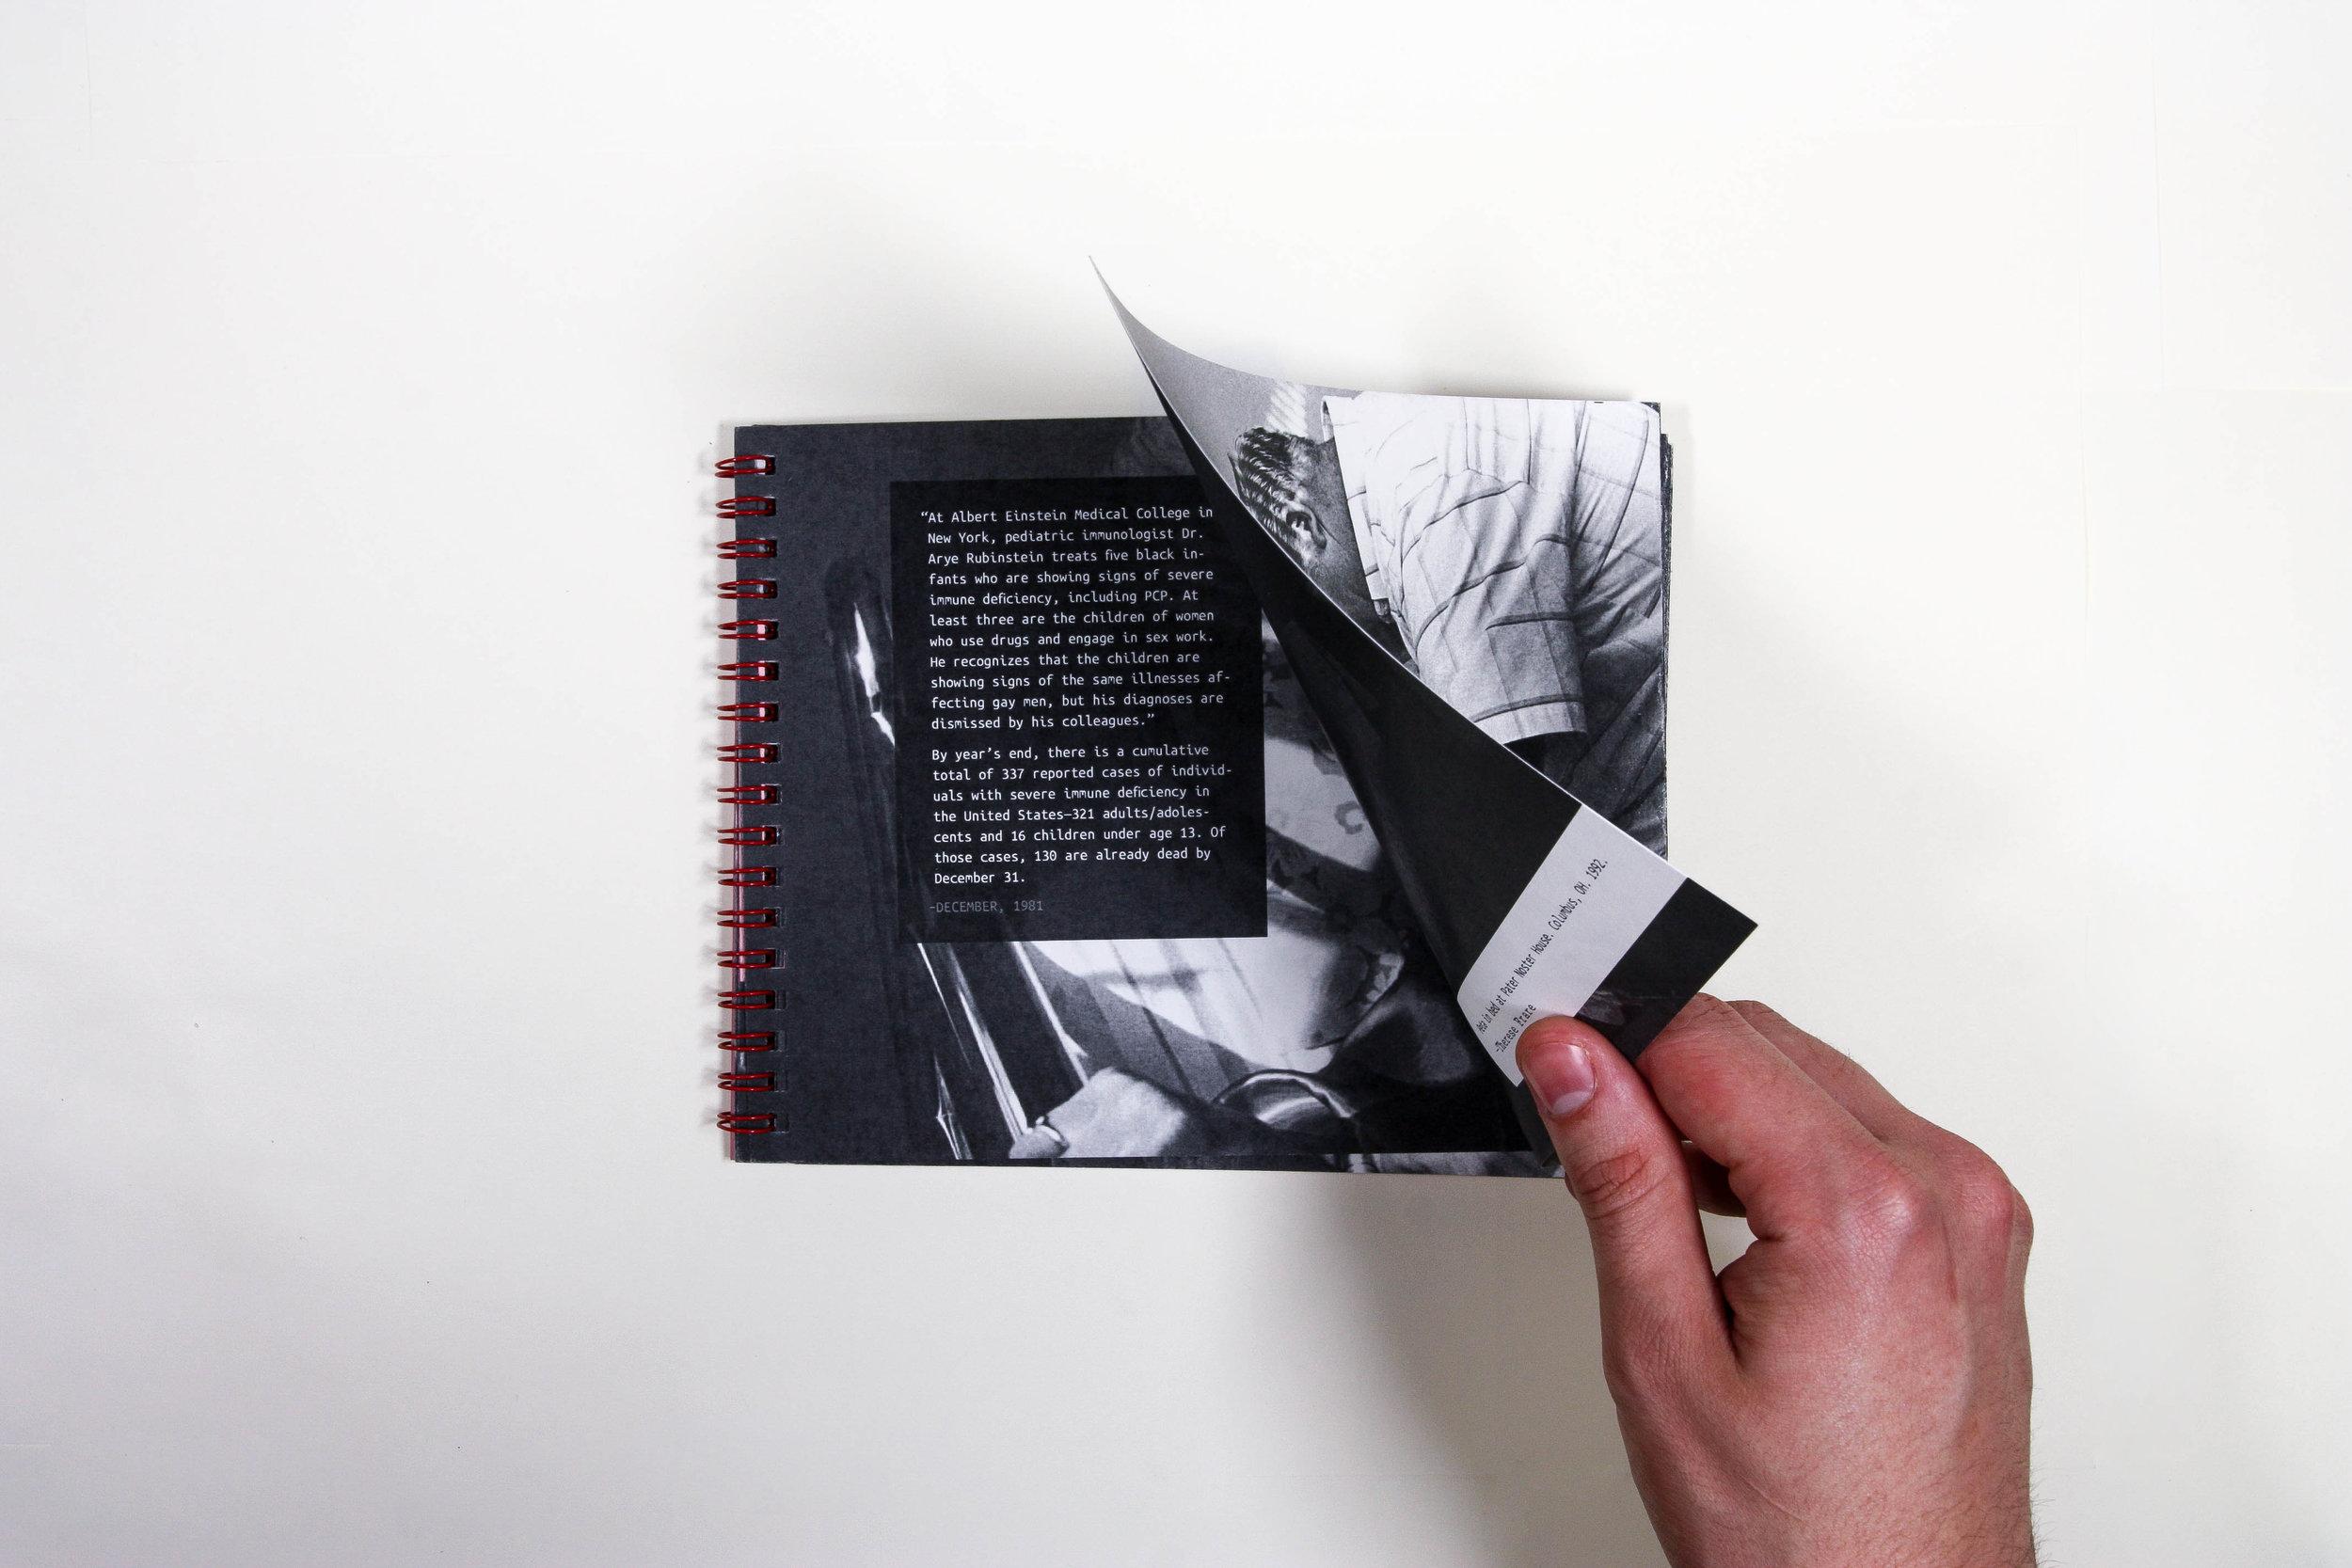 estory-bookimages-39.jpg